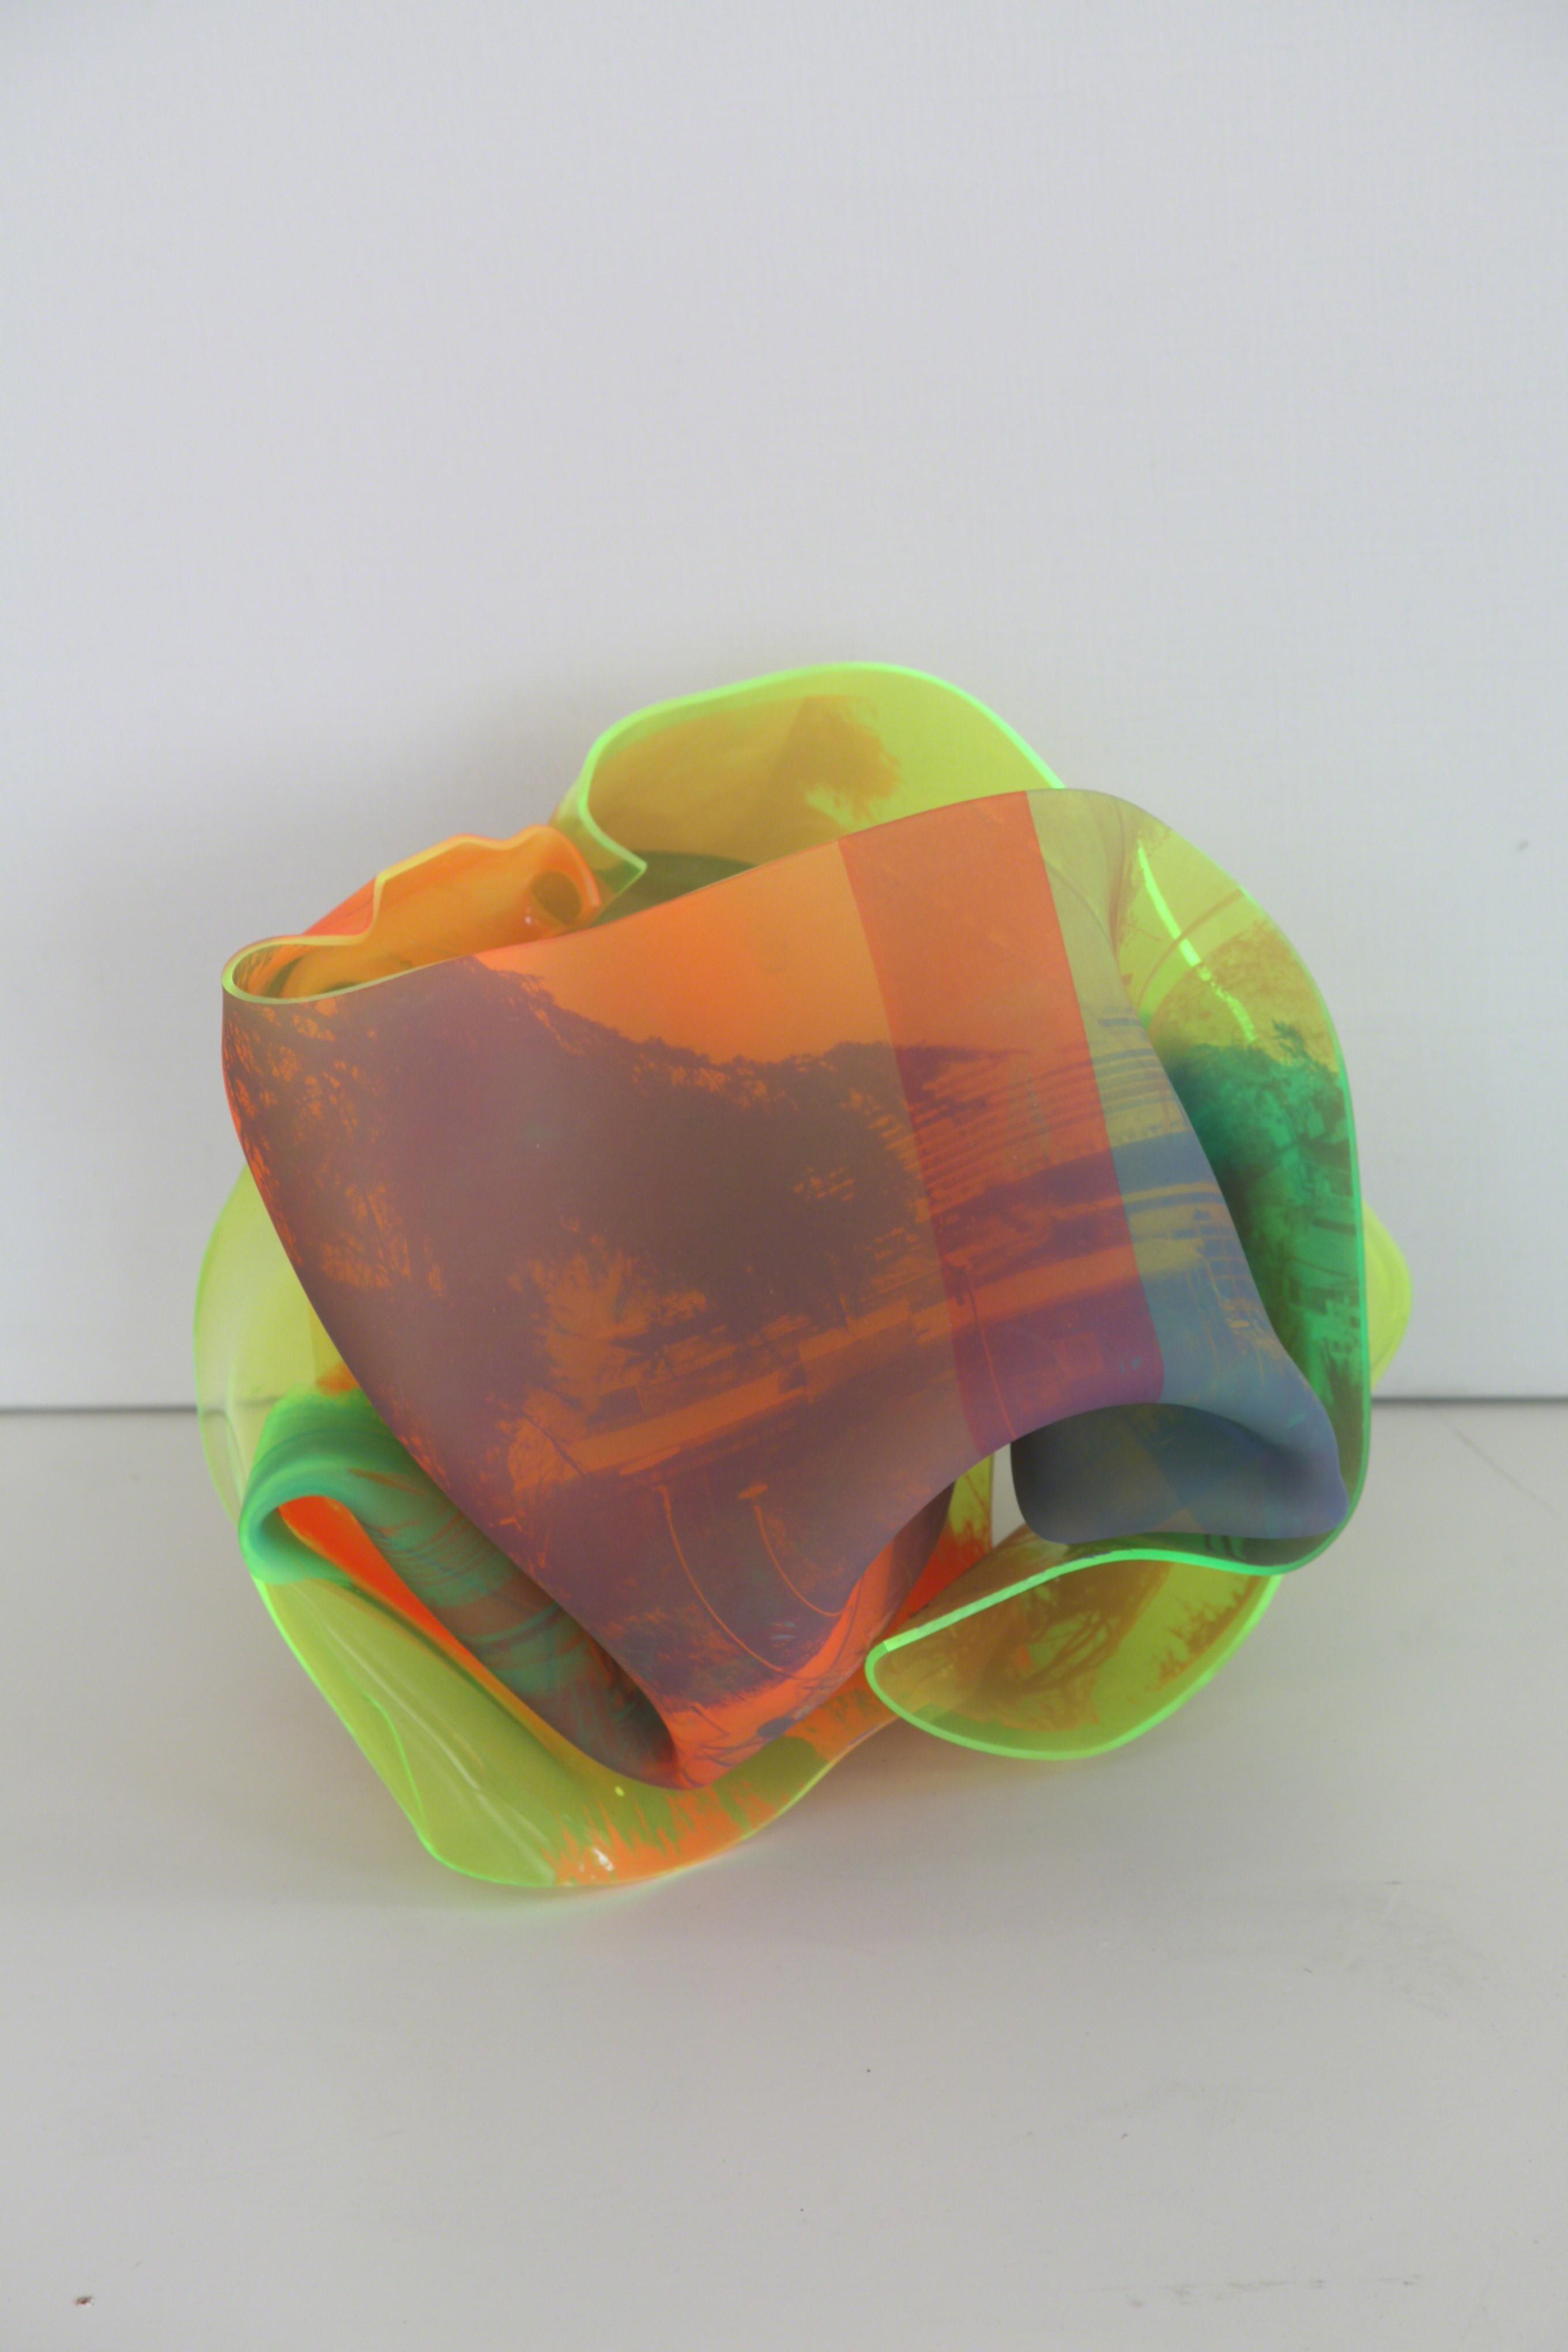 , 'object: 06-07 /14,' 2014, Pi Artworks Istanbul/London